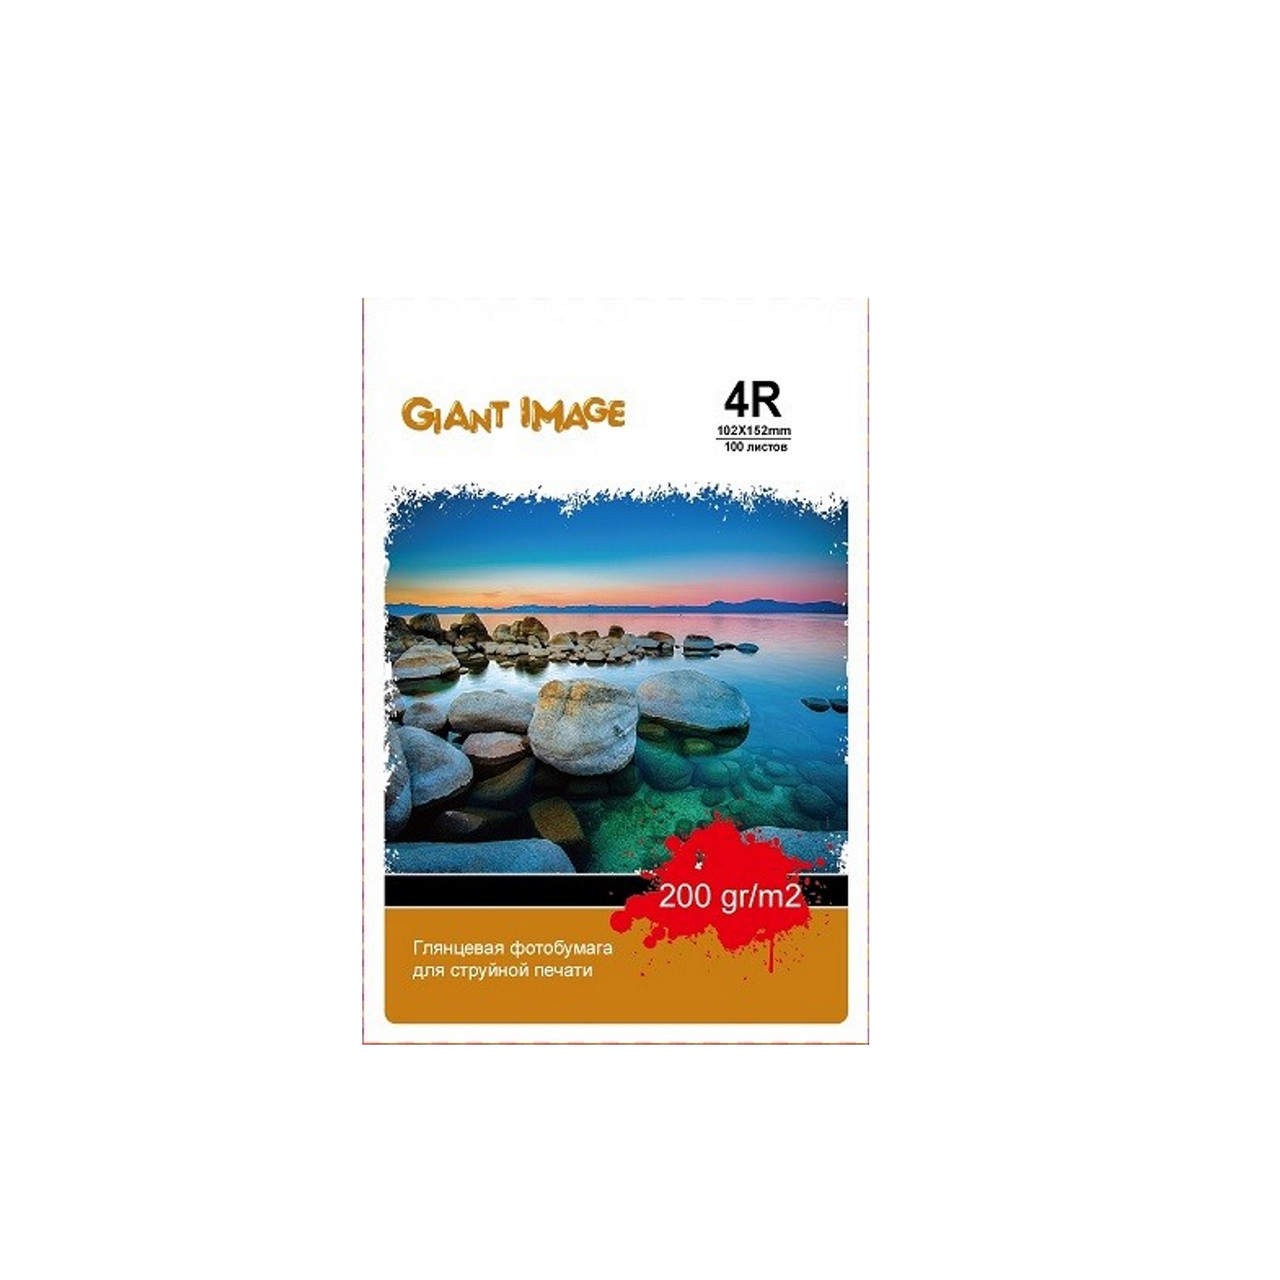 Бумага Giant Image GI-4R200100G плотность 200 г/м2 (А6 - 10х15 100 листов) GI-4R200100G